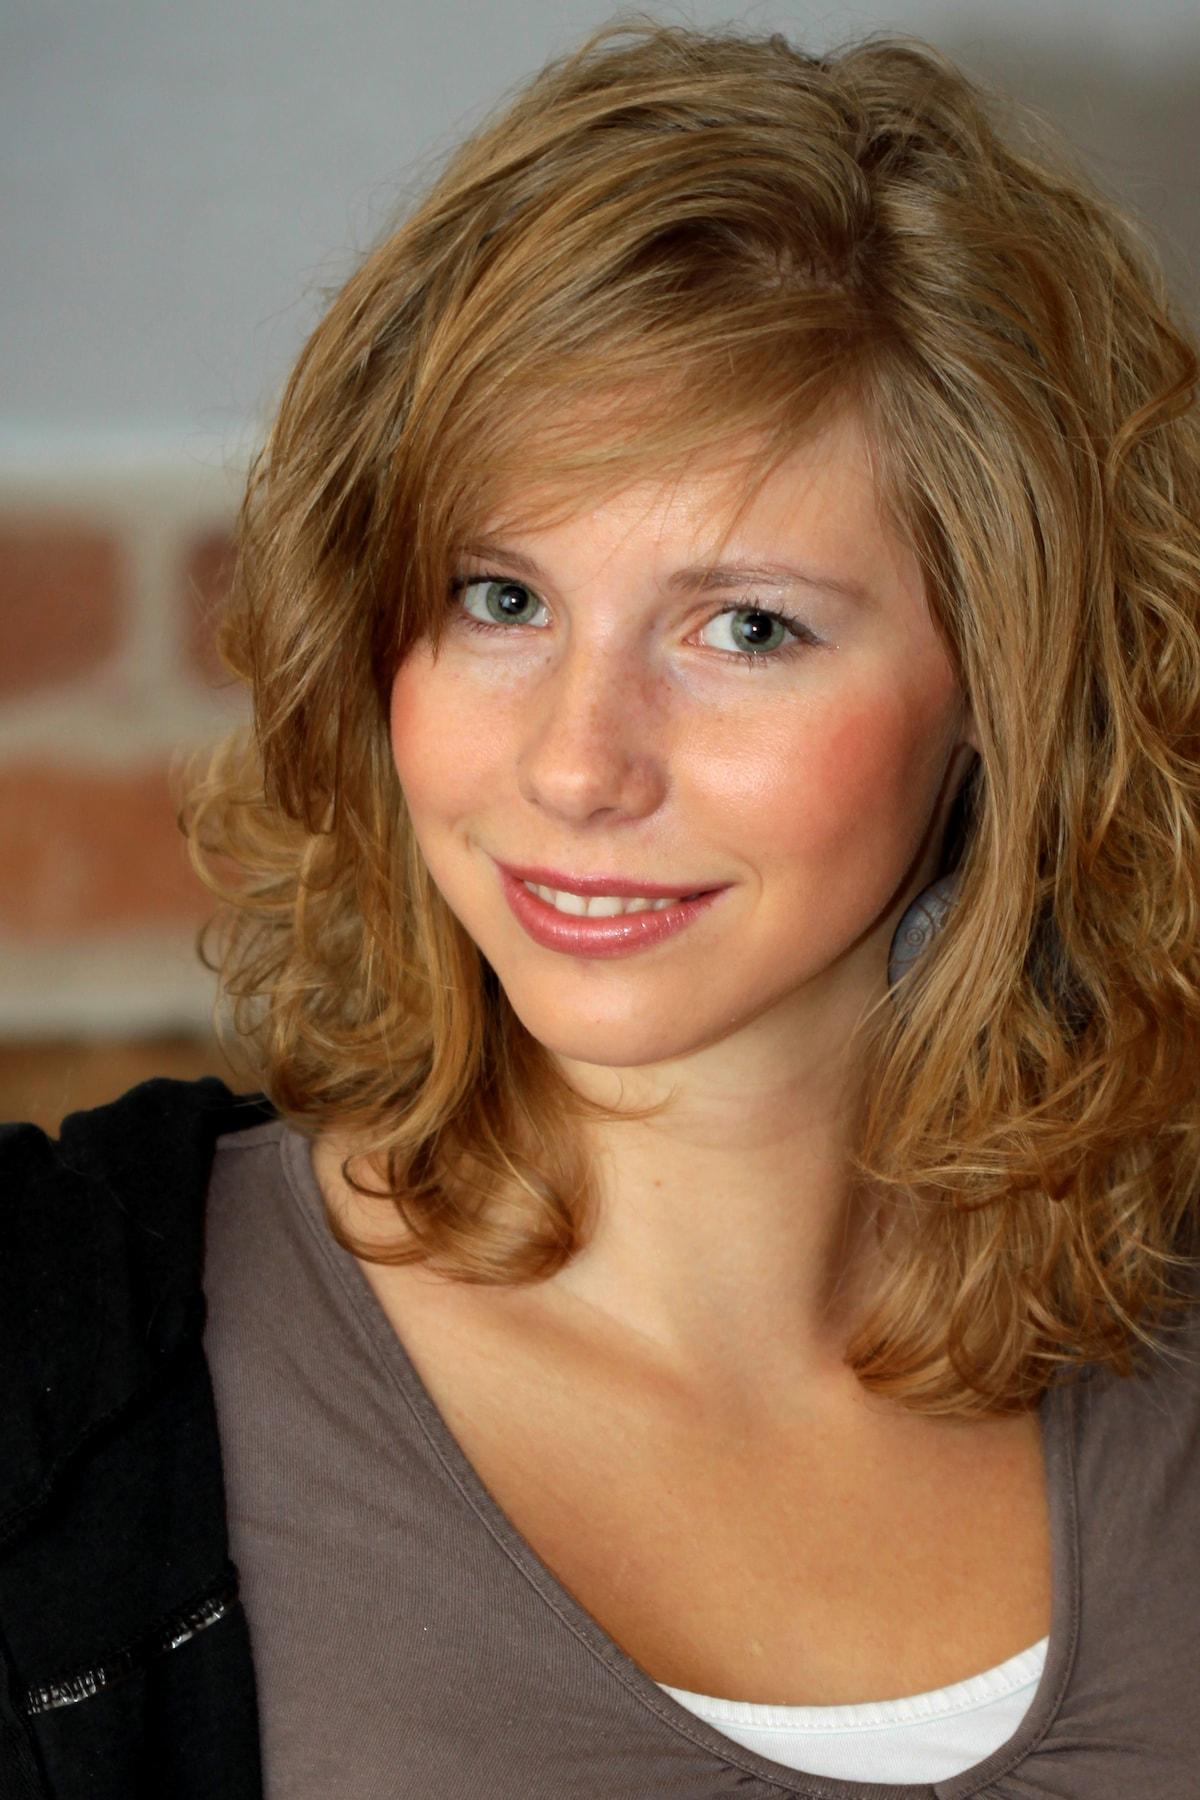 Kerstin from München